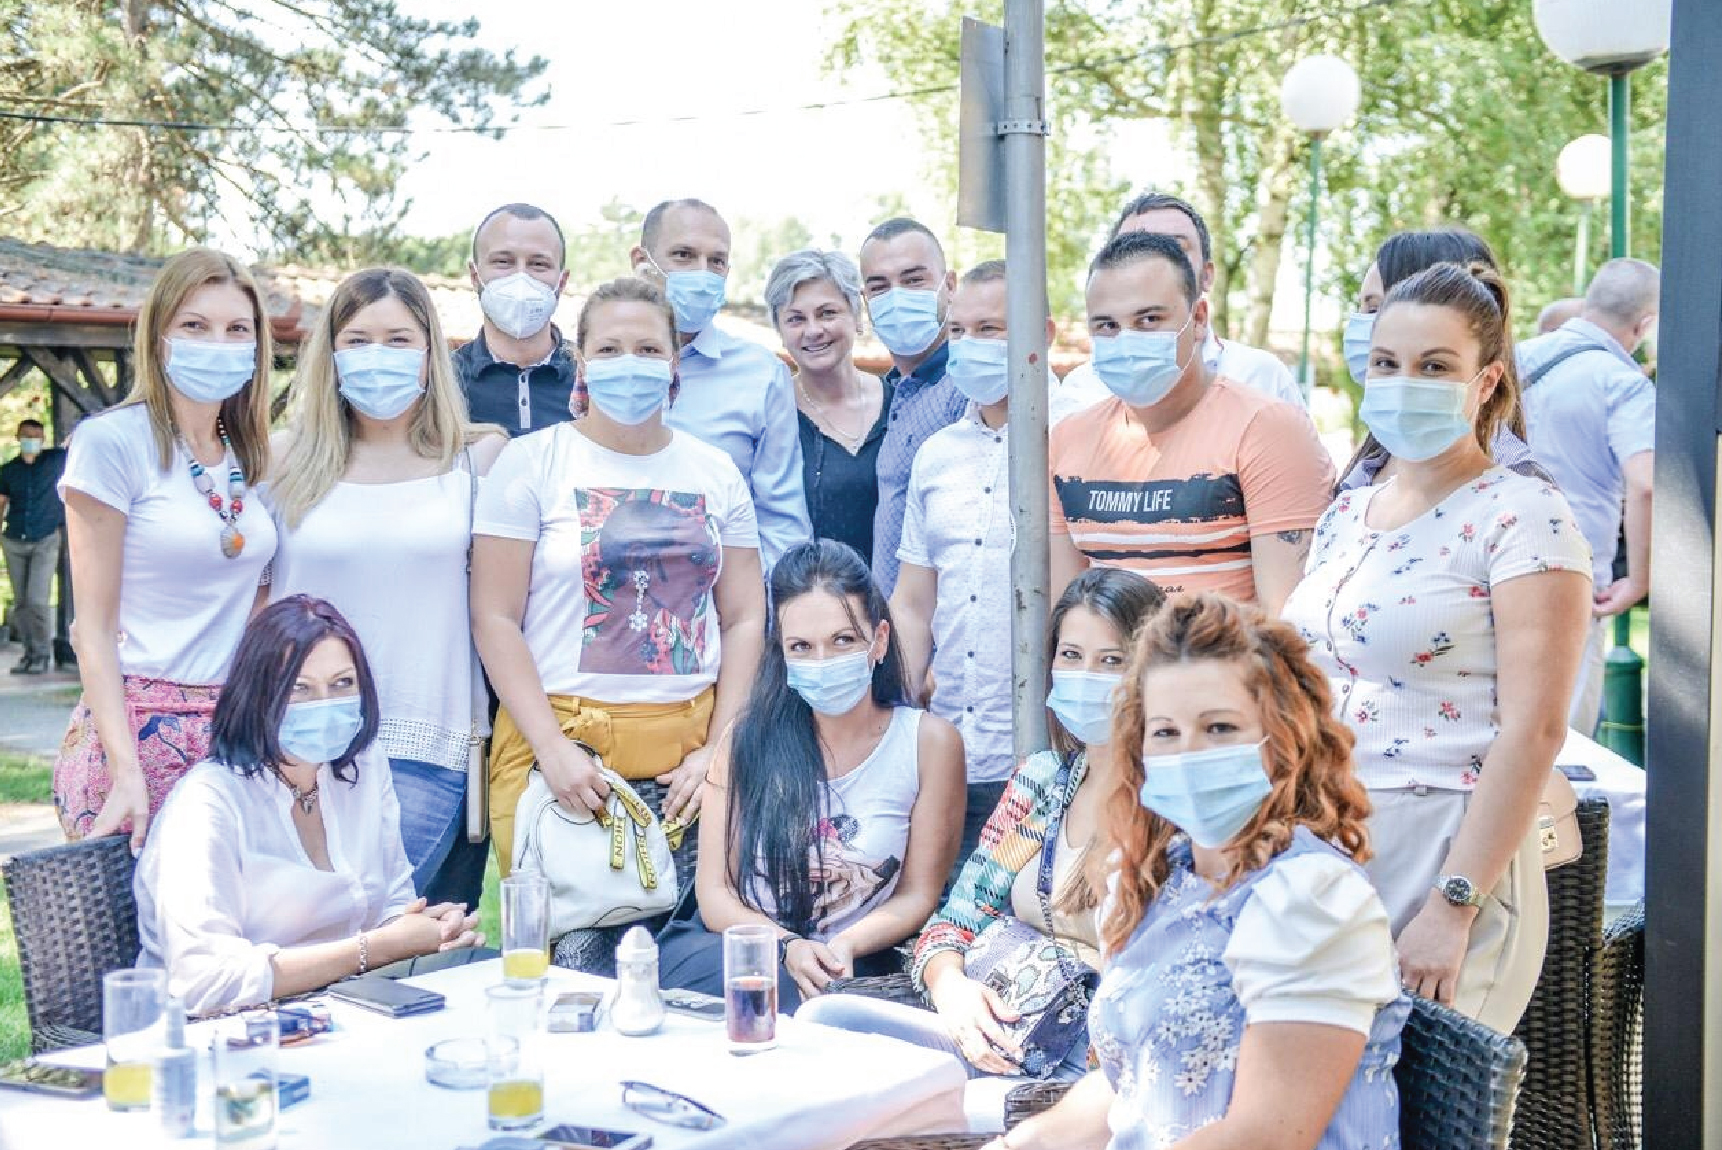 Лончар: Медицинари раде и без дана одмора